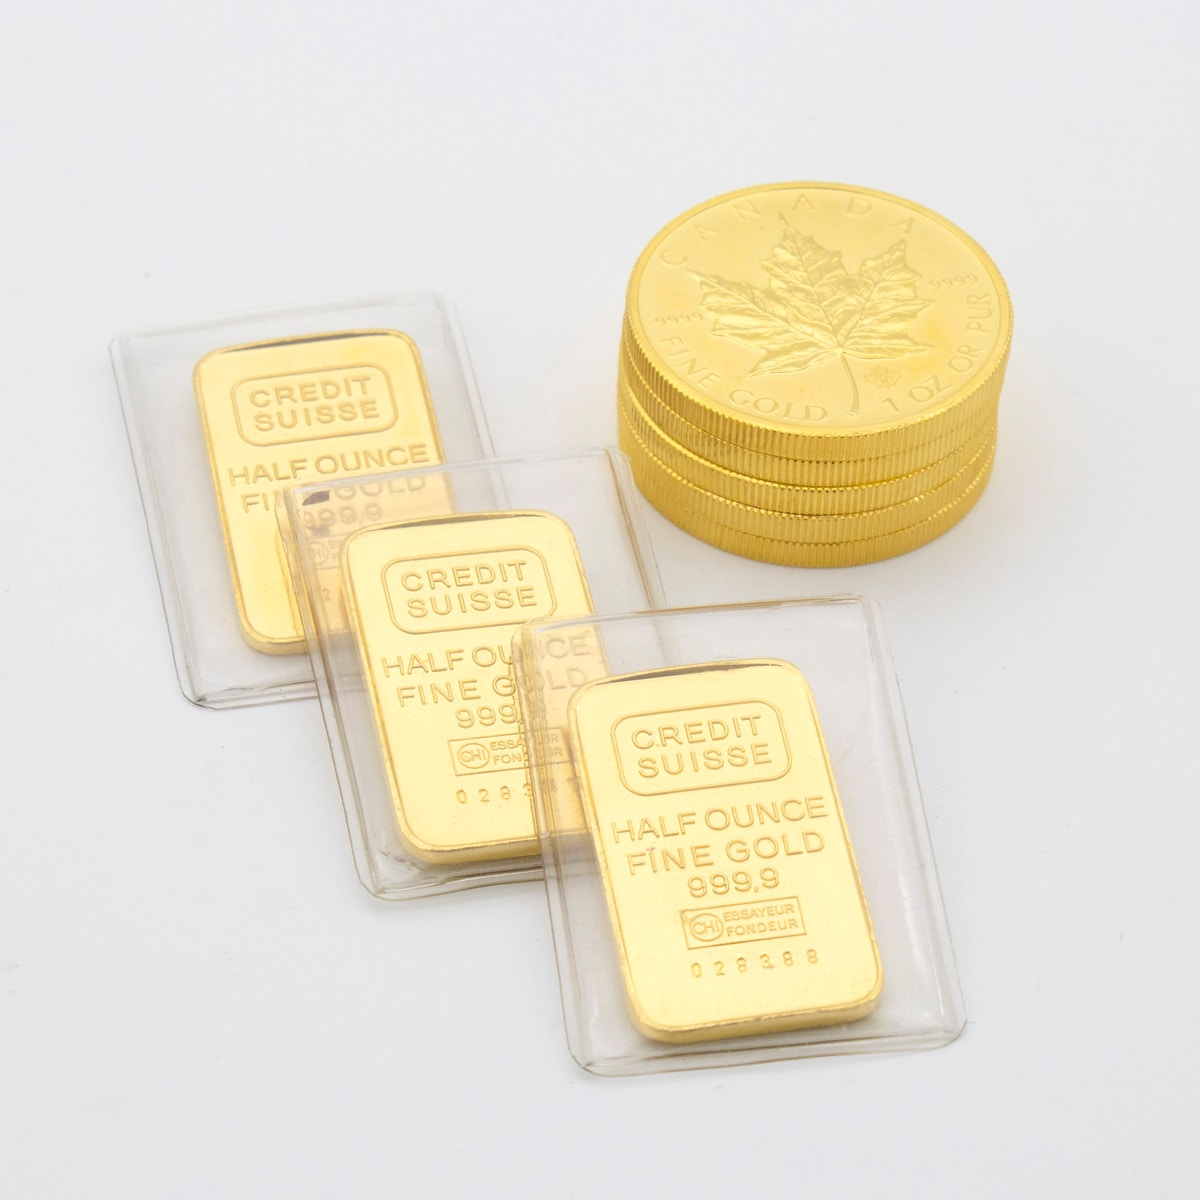 A GOLDEN LEGACY